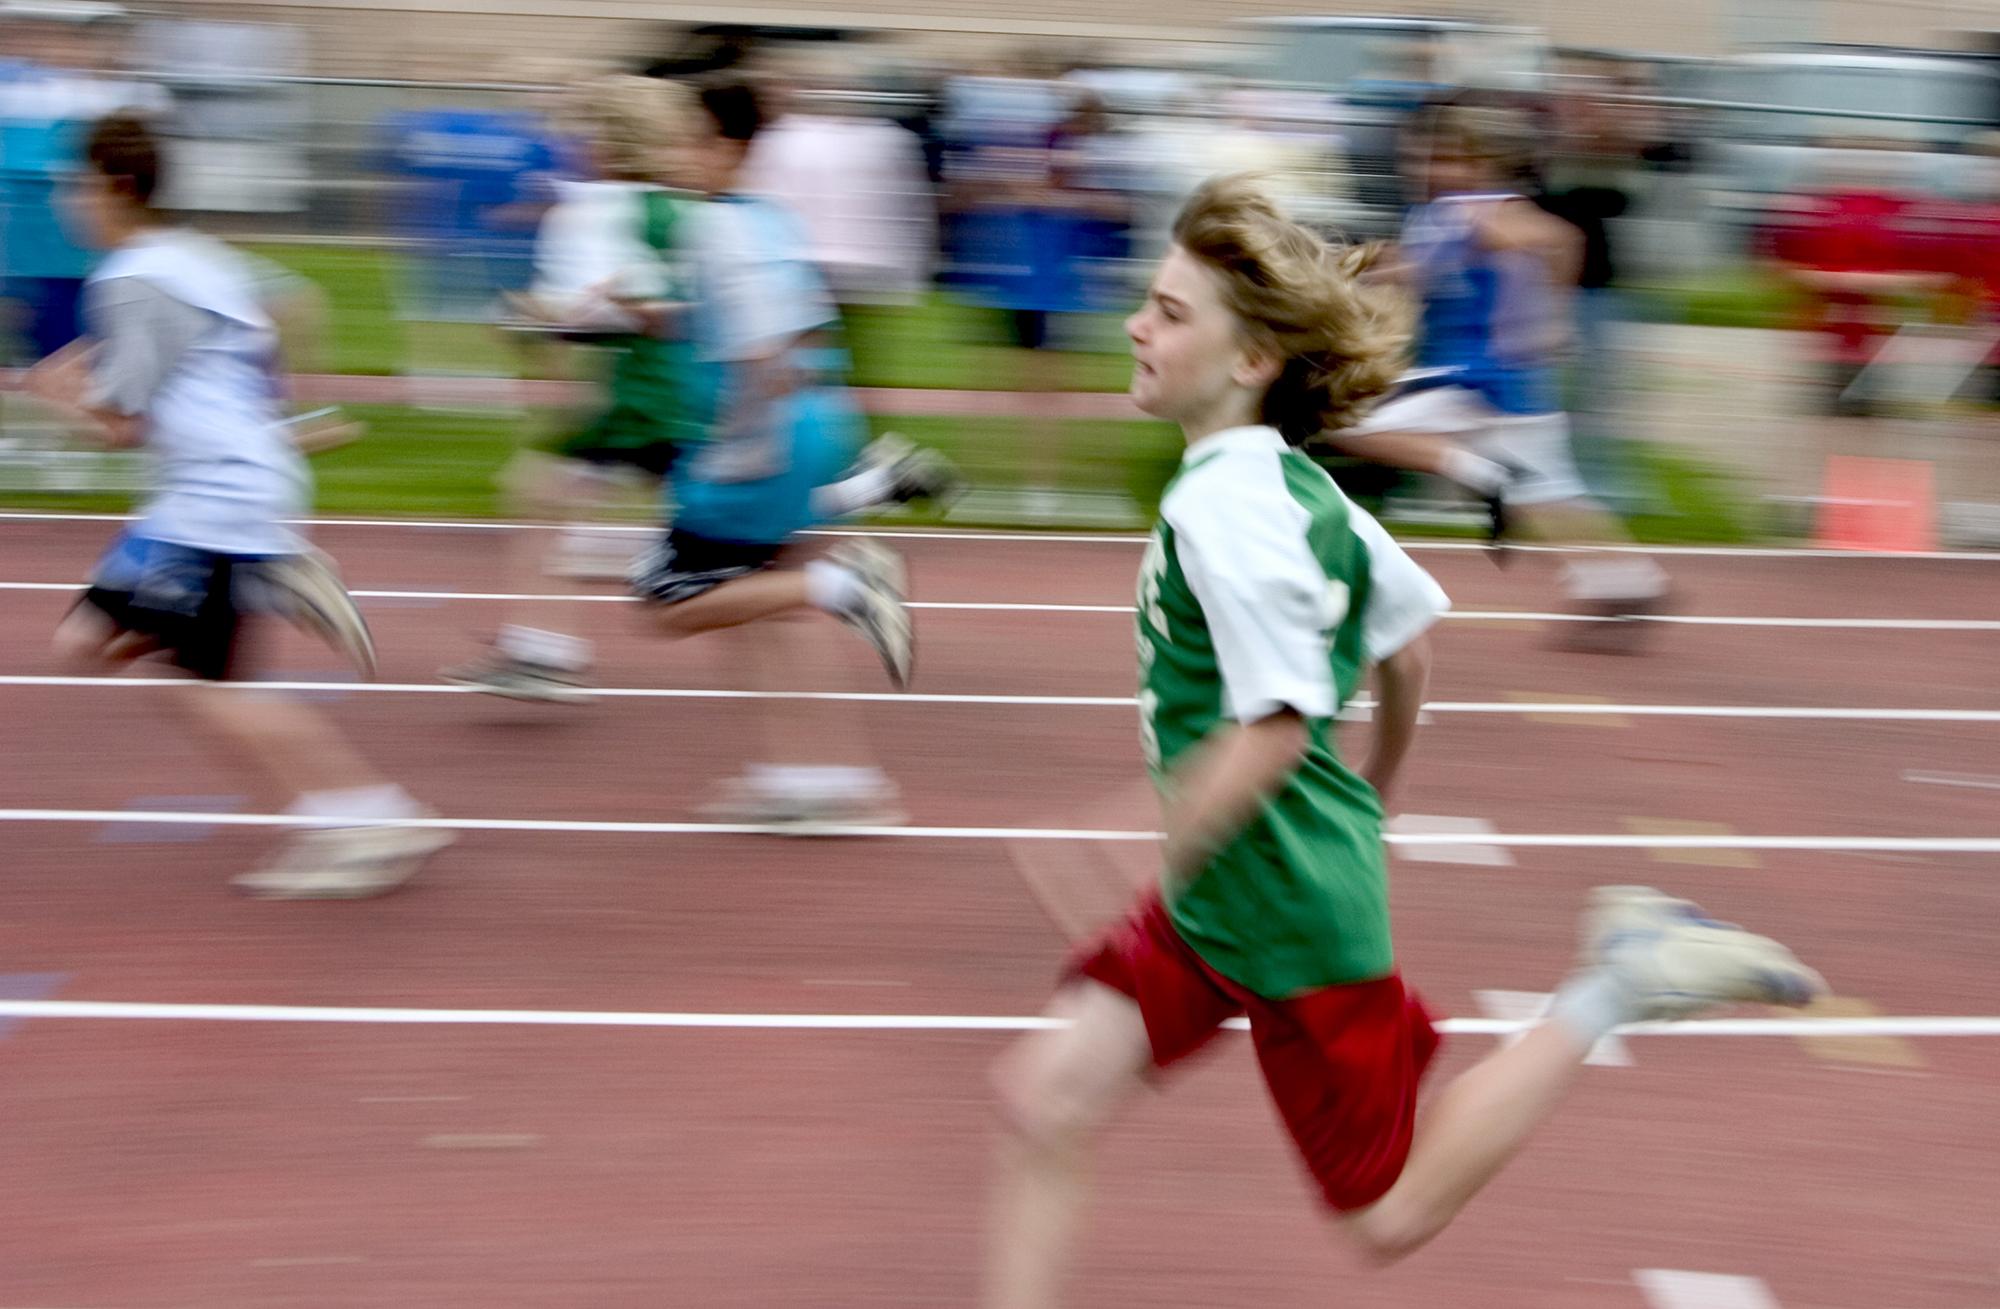 Boy running very fast in 100 meter foot race. Motion blur